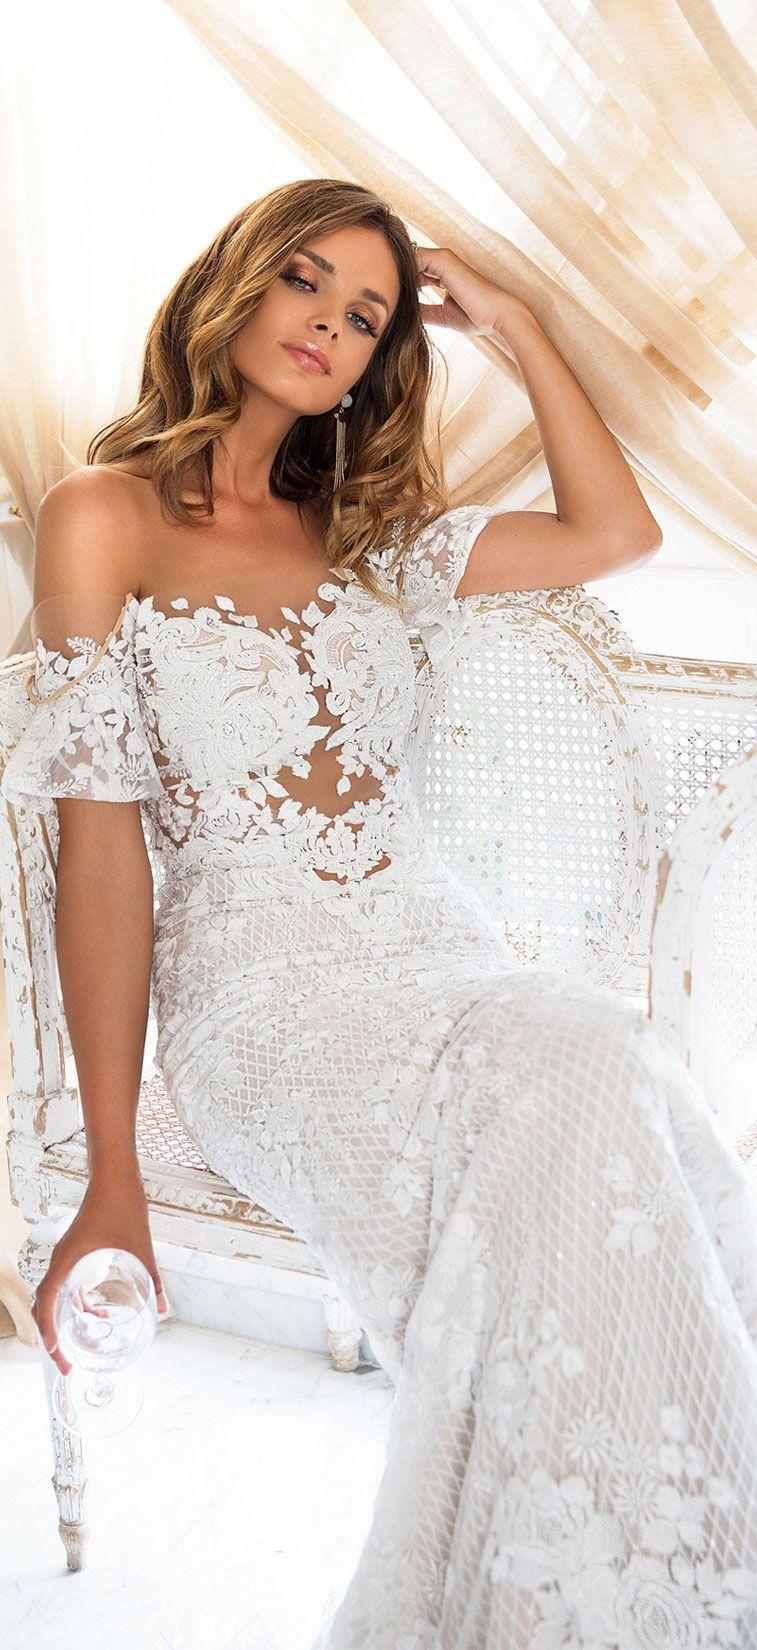 Off the shoulder short sleeves Illusion sweet heart neckline heavy embellishment mermaid wedding dress sweep train : Milla Nova wedding dress #weddingdress #weddinggown #wedding #bridedress